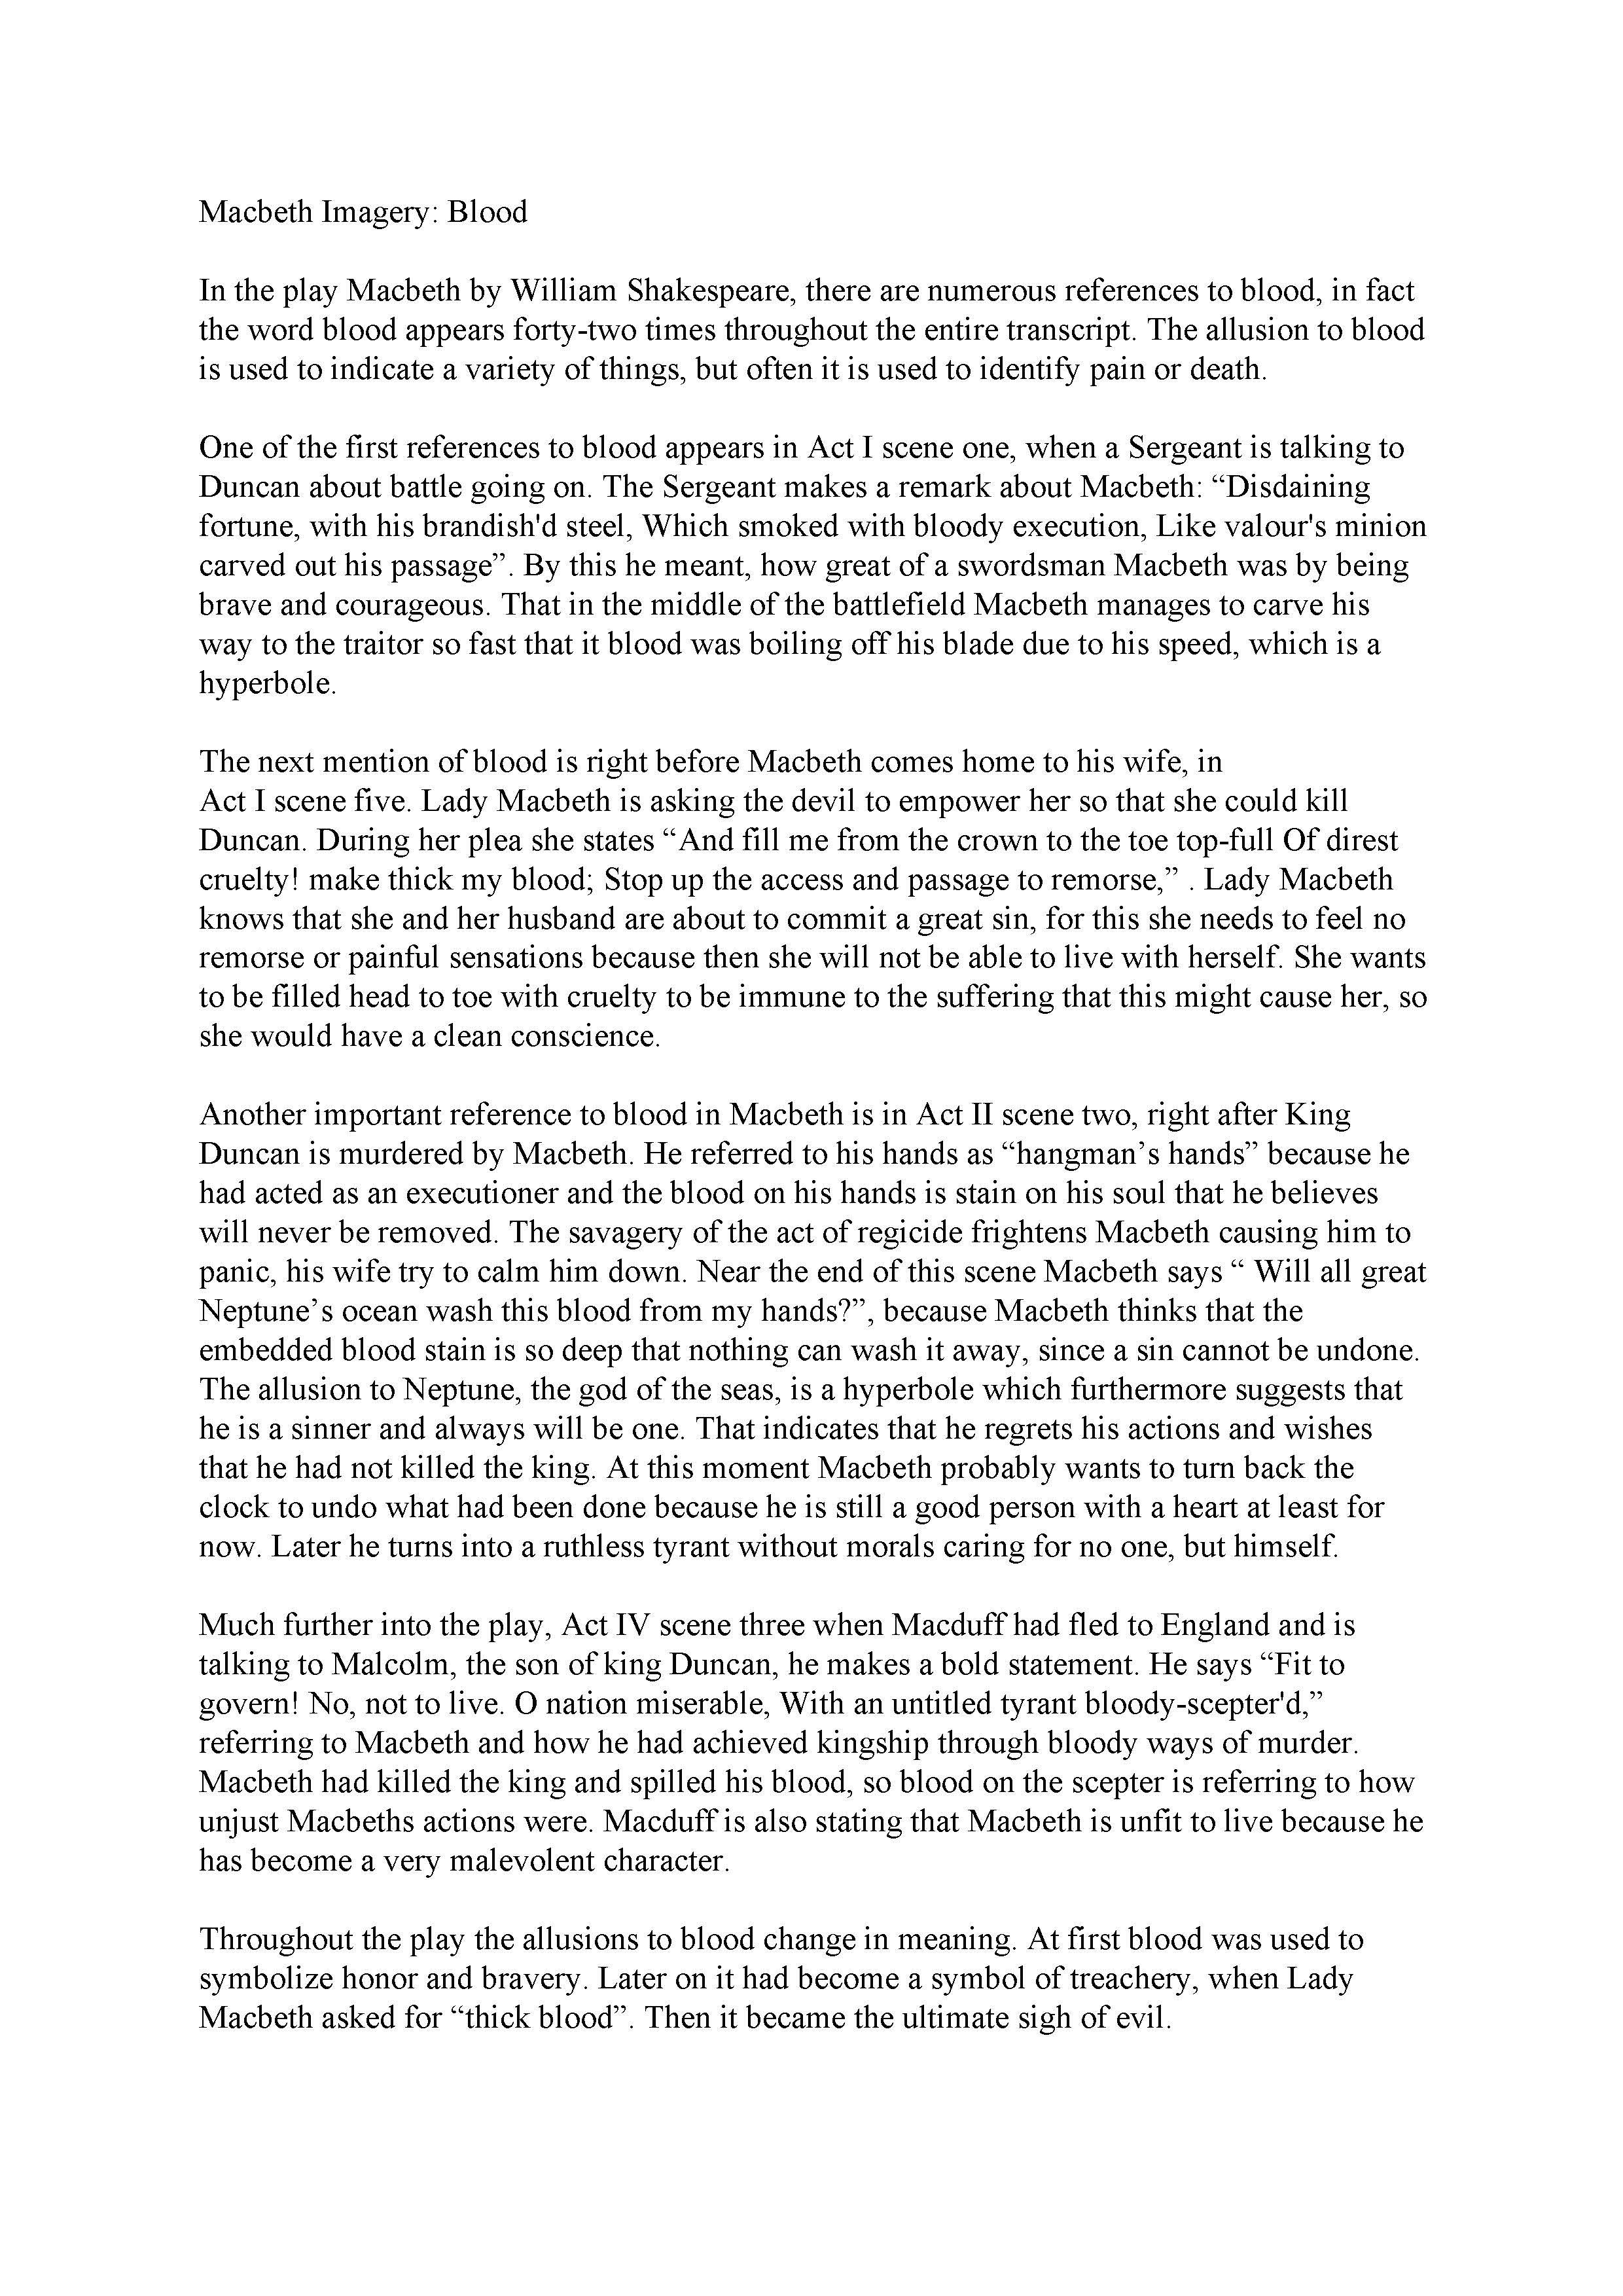 001 Macbeth Essay Sample Example Racism Surprising Examples Full